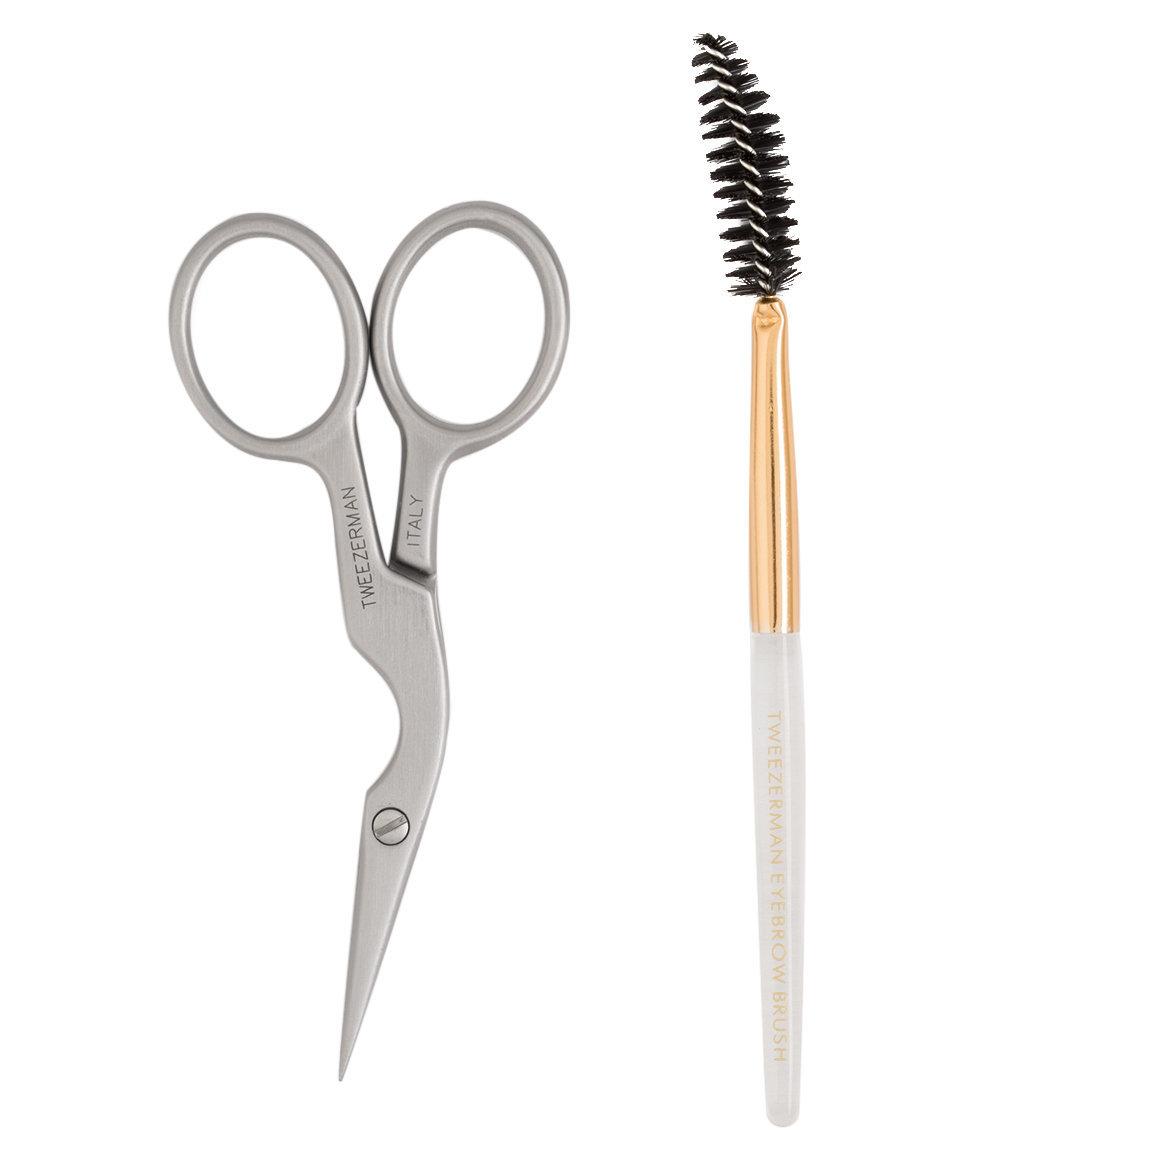 Tweezerman Brow Shaping Scissors & Brush product swatch.